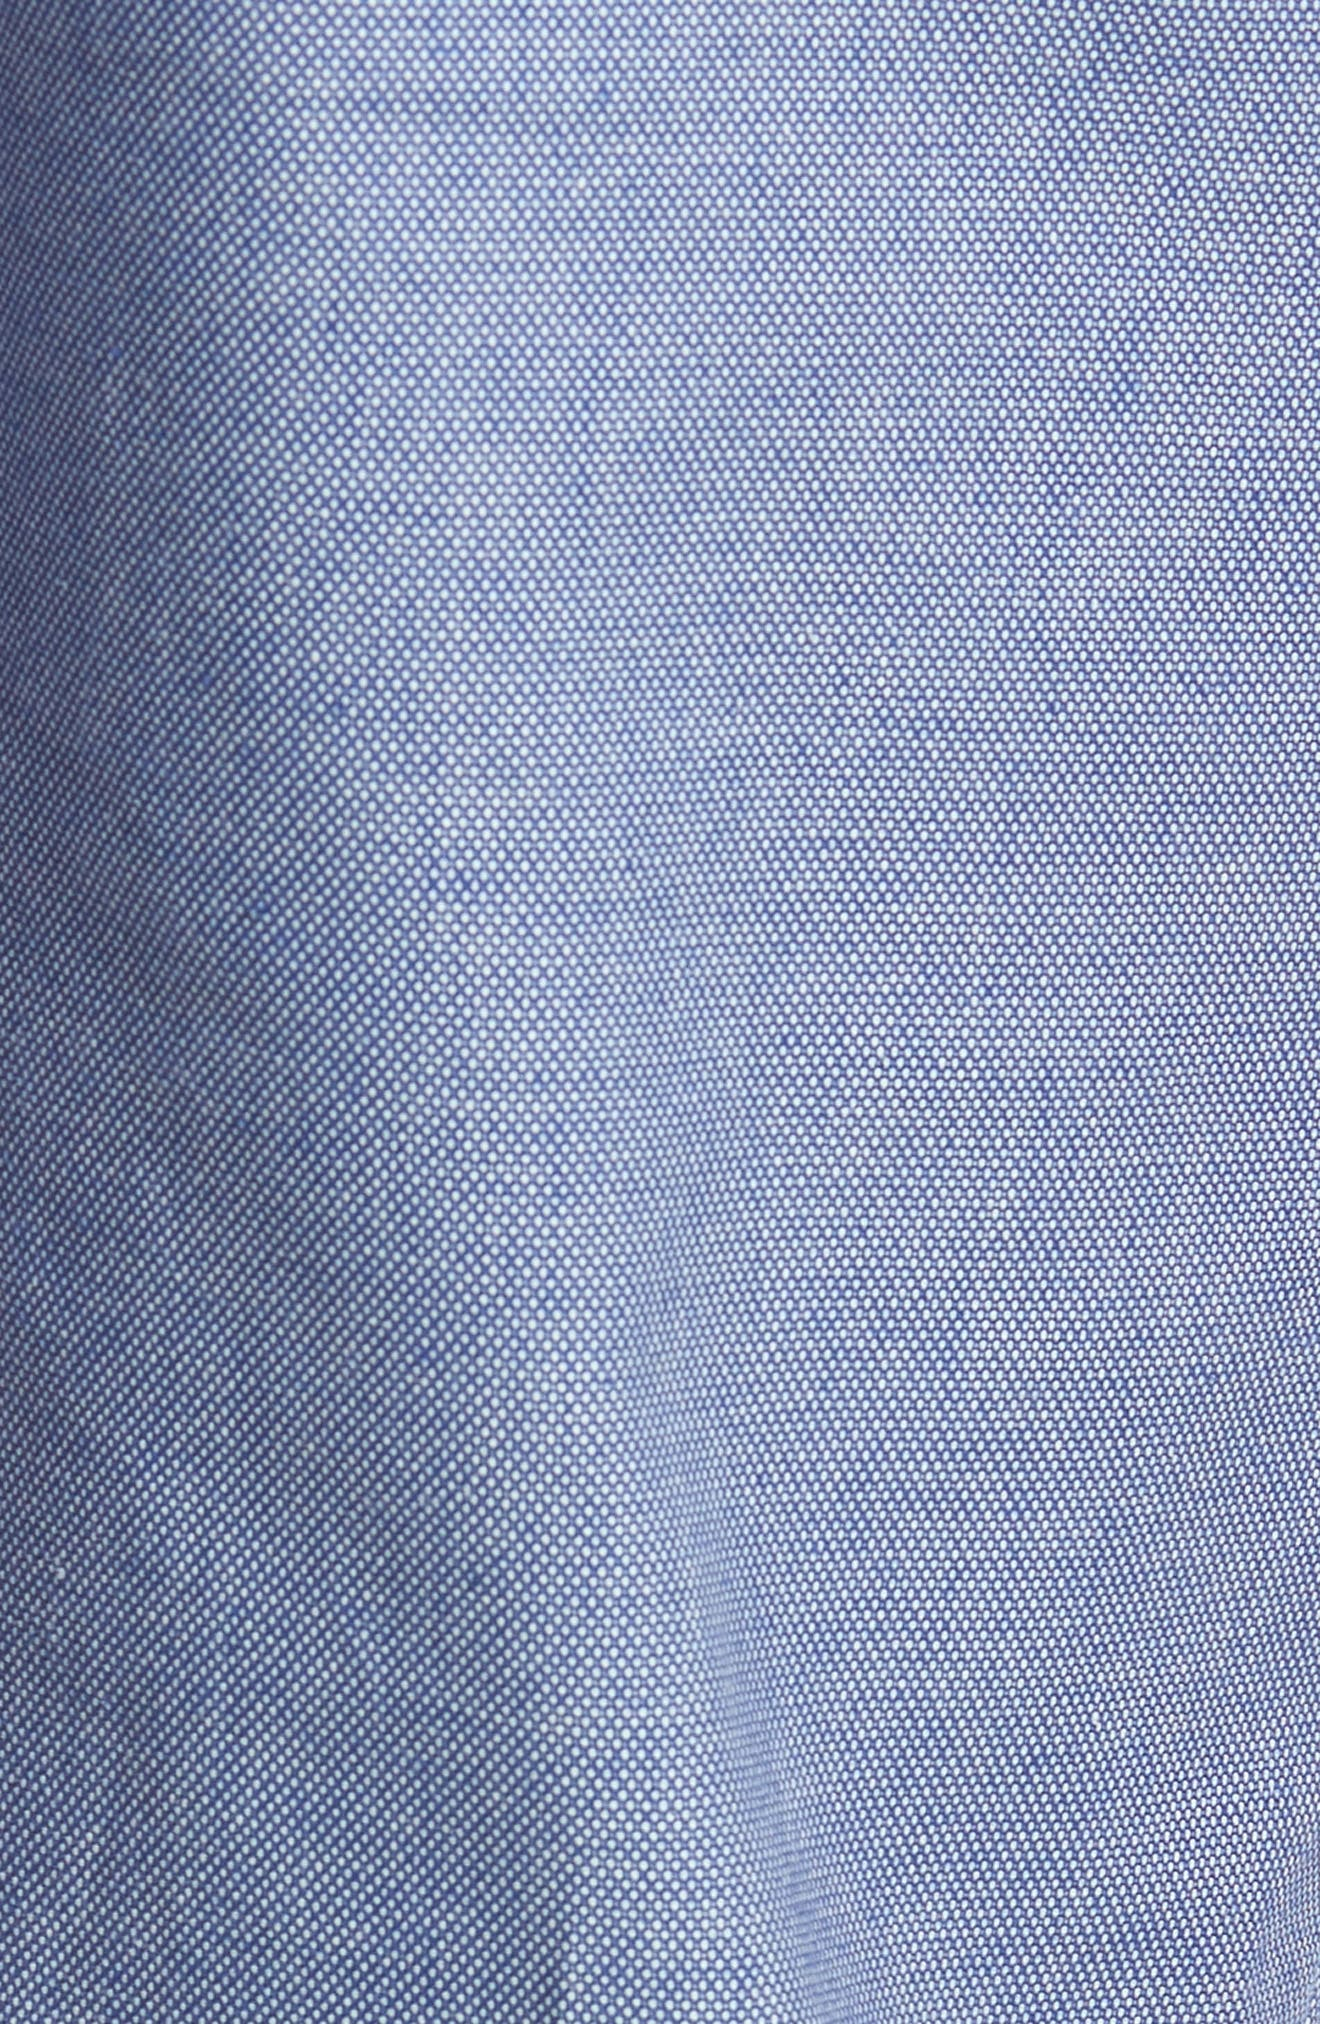 Holldet Flat Front Stretch Solid Cotton Pants,                             Alternate thumbnail 4, color,                             Light Blue